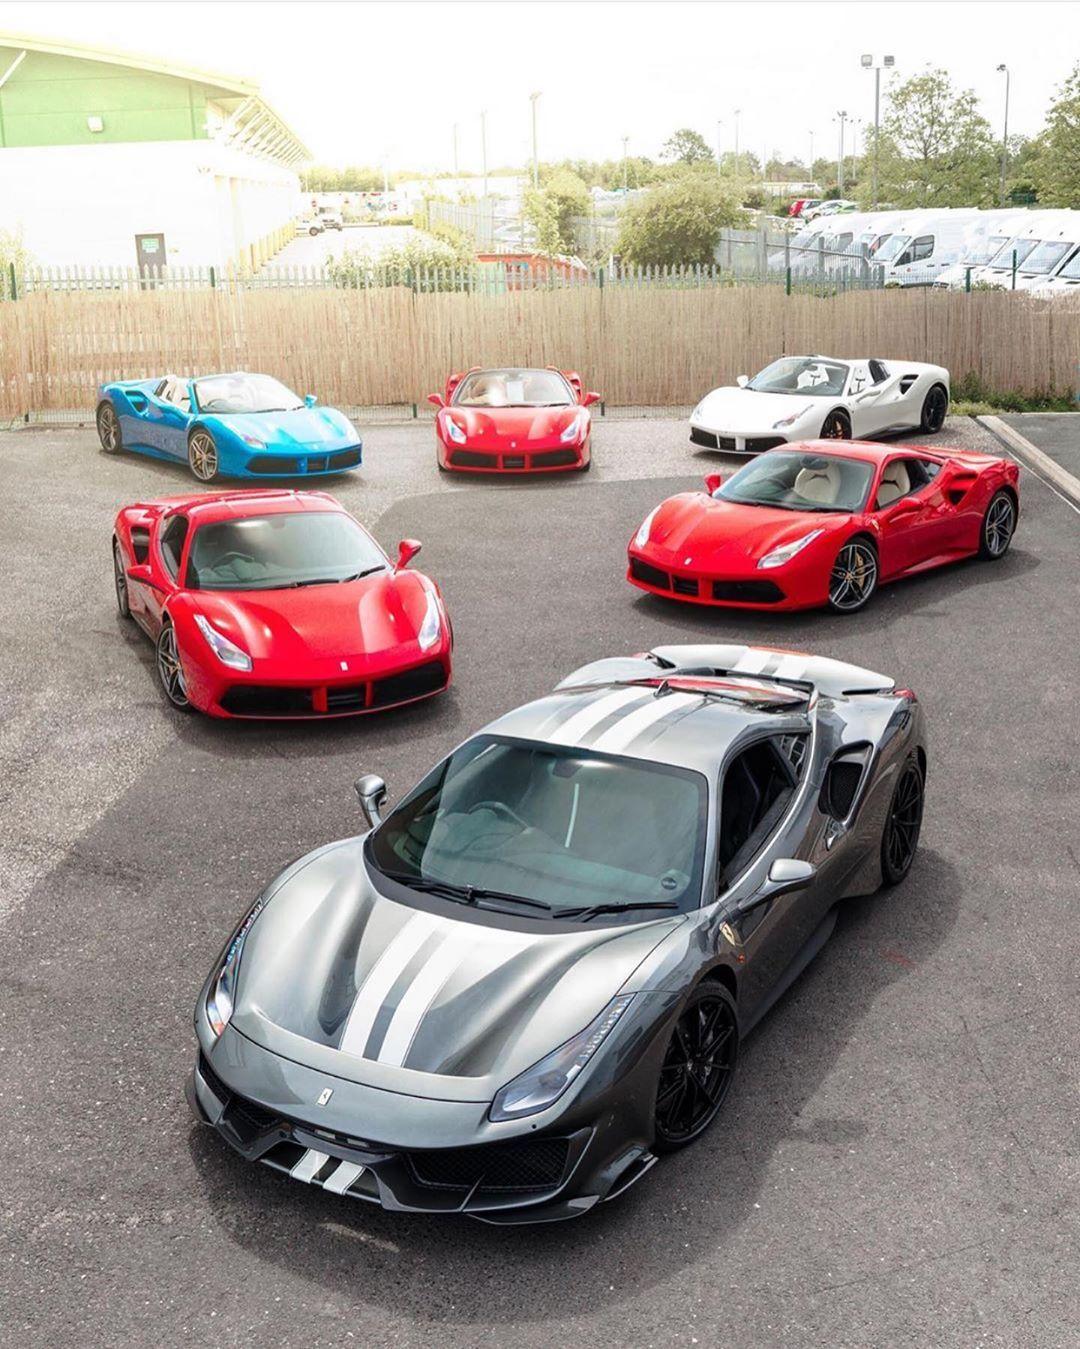 Ferrari 488 Generation On Instagram Would You Dare Doing Such Dark Via Arnaud 4k No Copyright Infringemen Super Luxury Cars Super Cars Ferrari Car